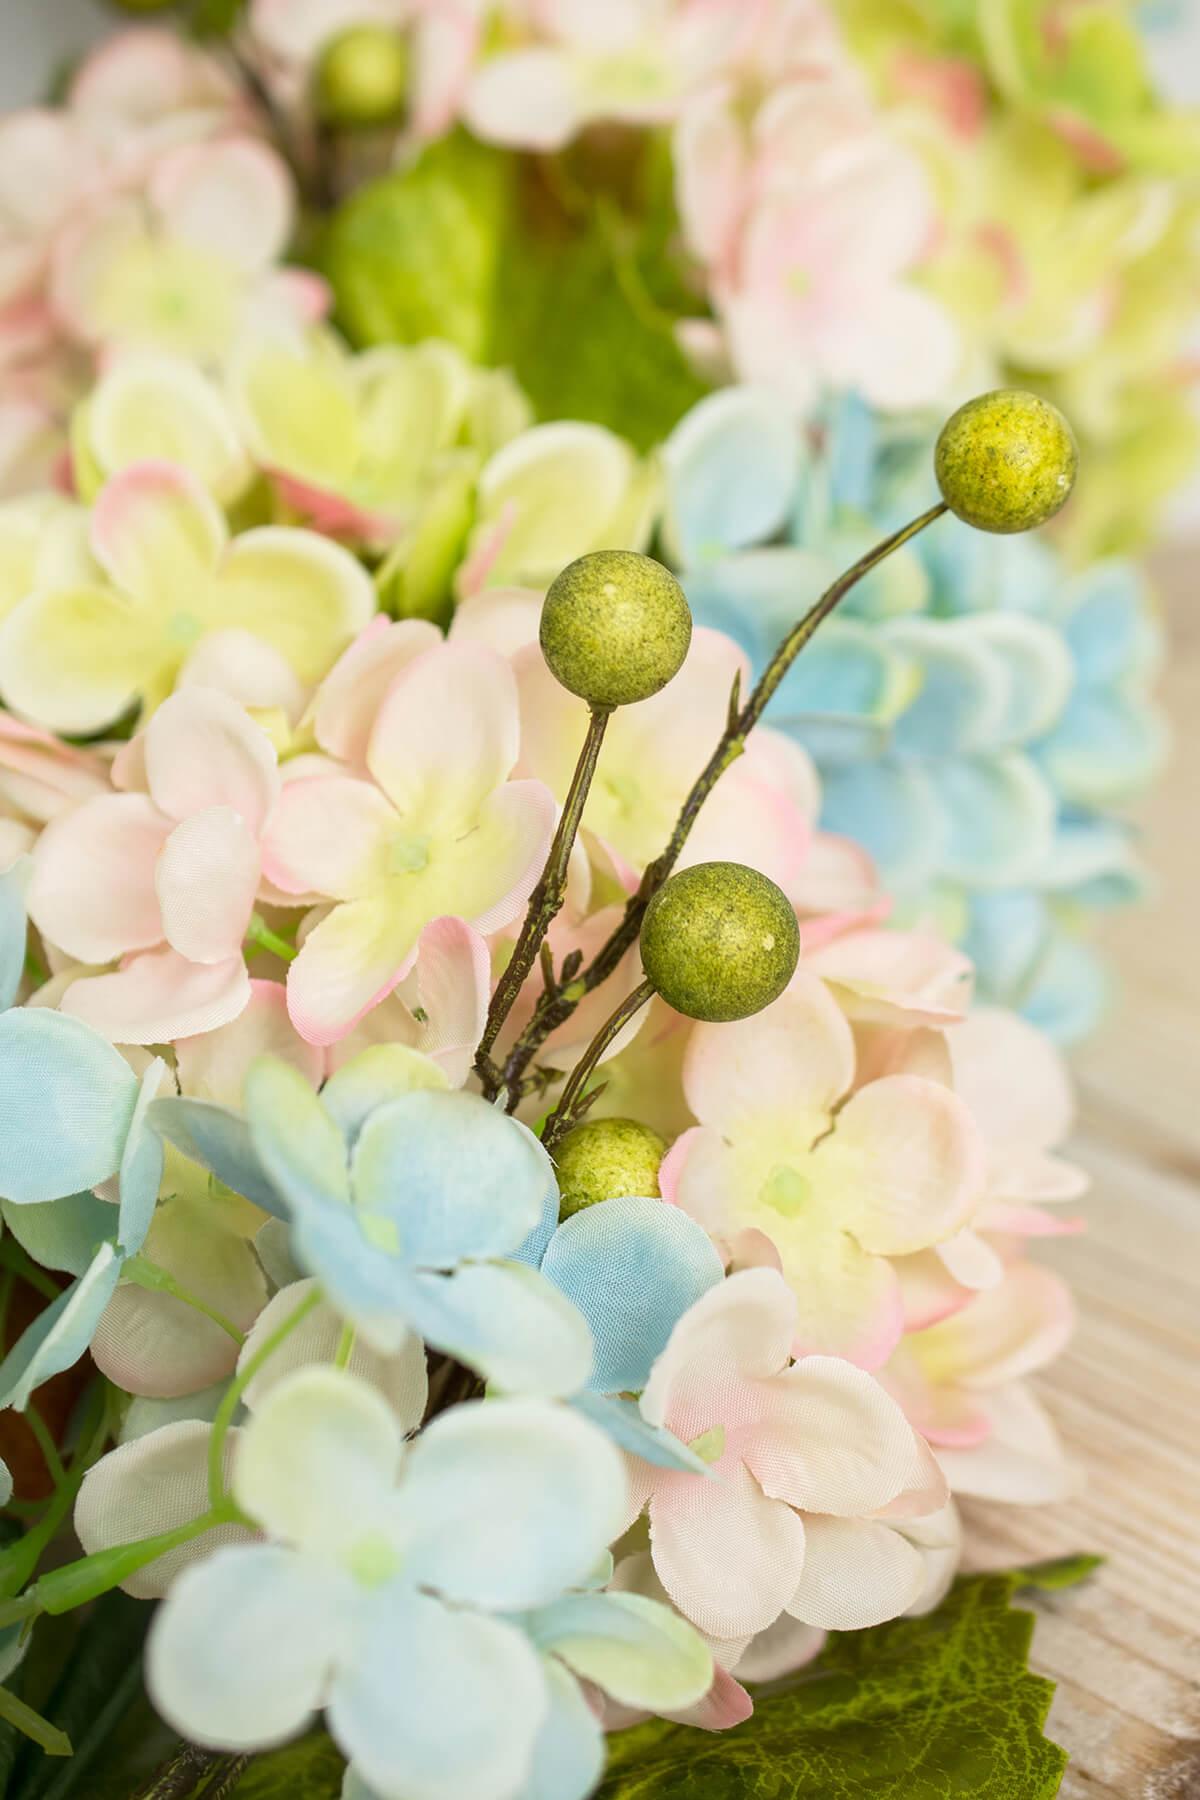 Garland Hydrangea 4ft Mixed Pastels